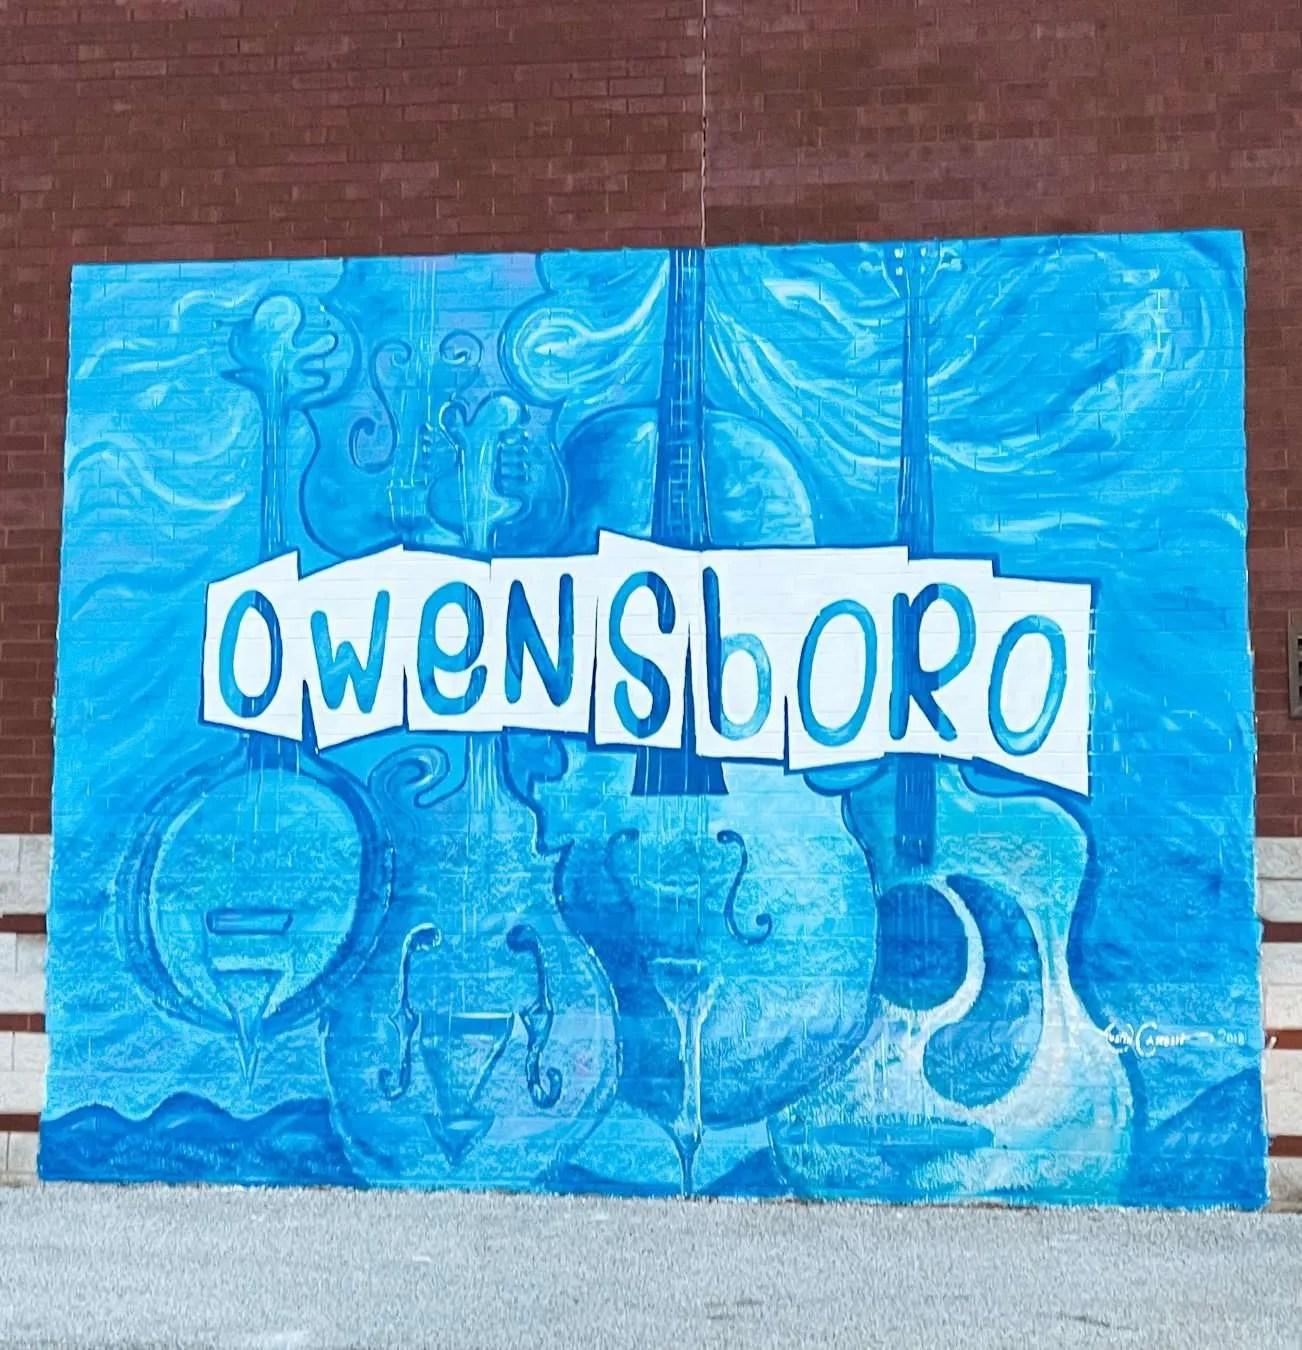 Owensboro blue musical instruments mural in owensboro kentucky, Weather in owensboro, restaurants in owensboro ky, things to do in owensboro kentucky, free things to do in owensboro ky